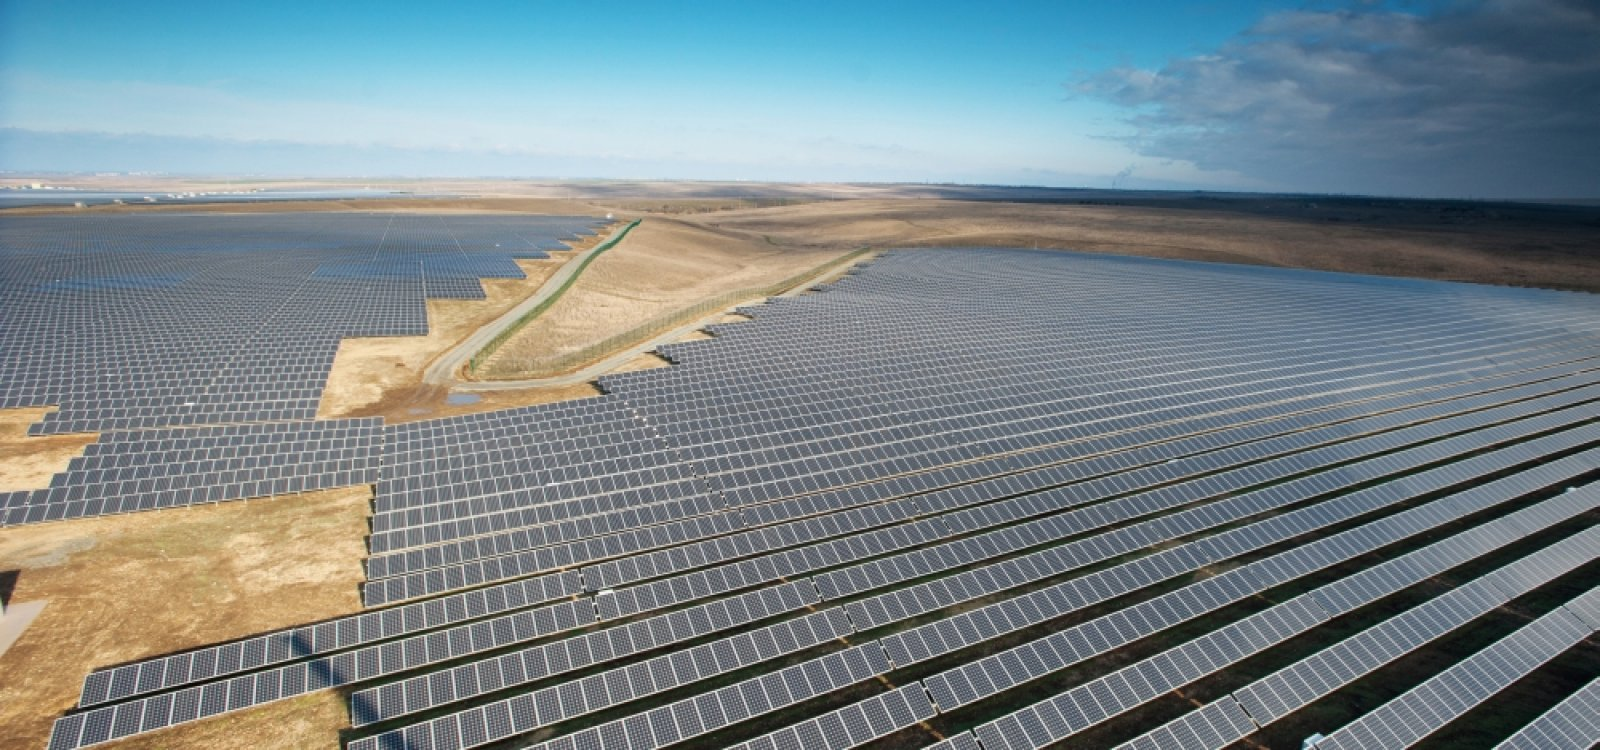 Macrocentral d'energia solar a Crimea (Rússia)